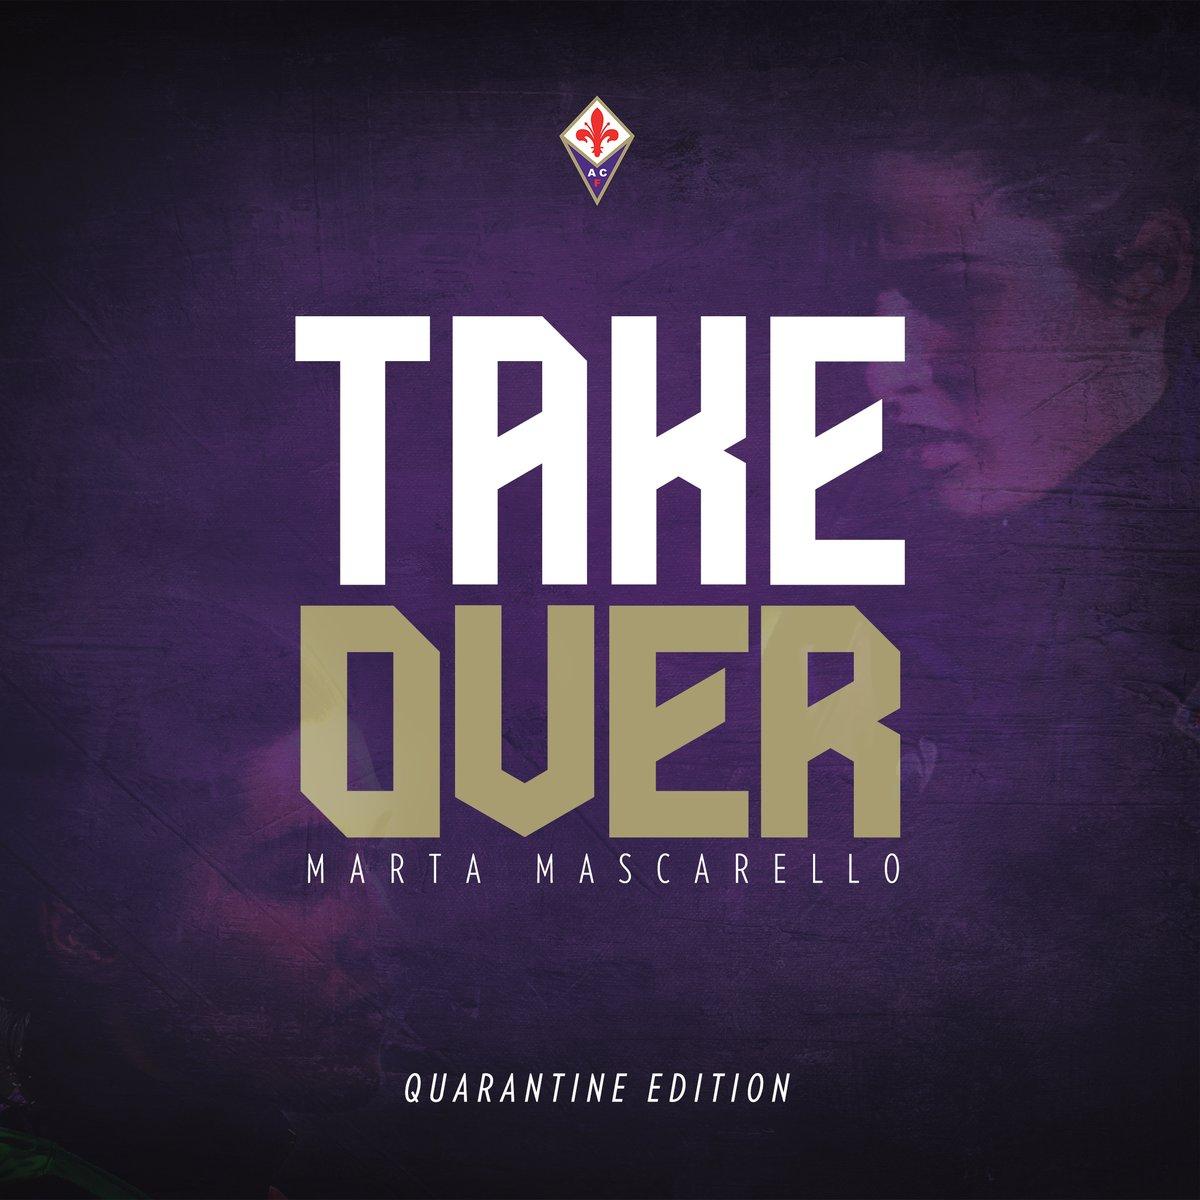 📲 INSTAGRAM TAKEOVER - QUARANTINE EDITION  ⏰ Domani 24 ore insieme a Marta #Mascarello su ➡️ https://t.co/vrtmJEjWyk  #ForzaViola 💜 #Fiorentina https://t.co/VxoAj4t5YJ